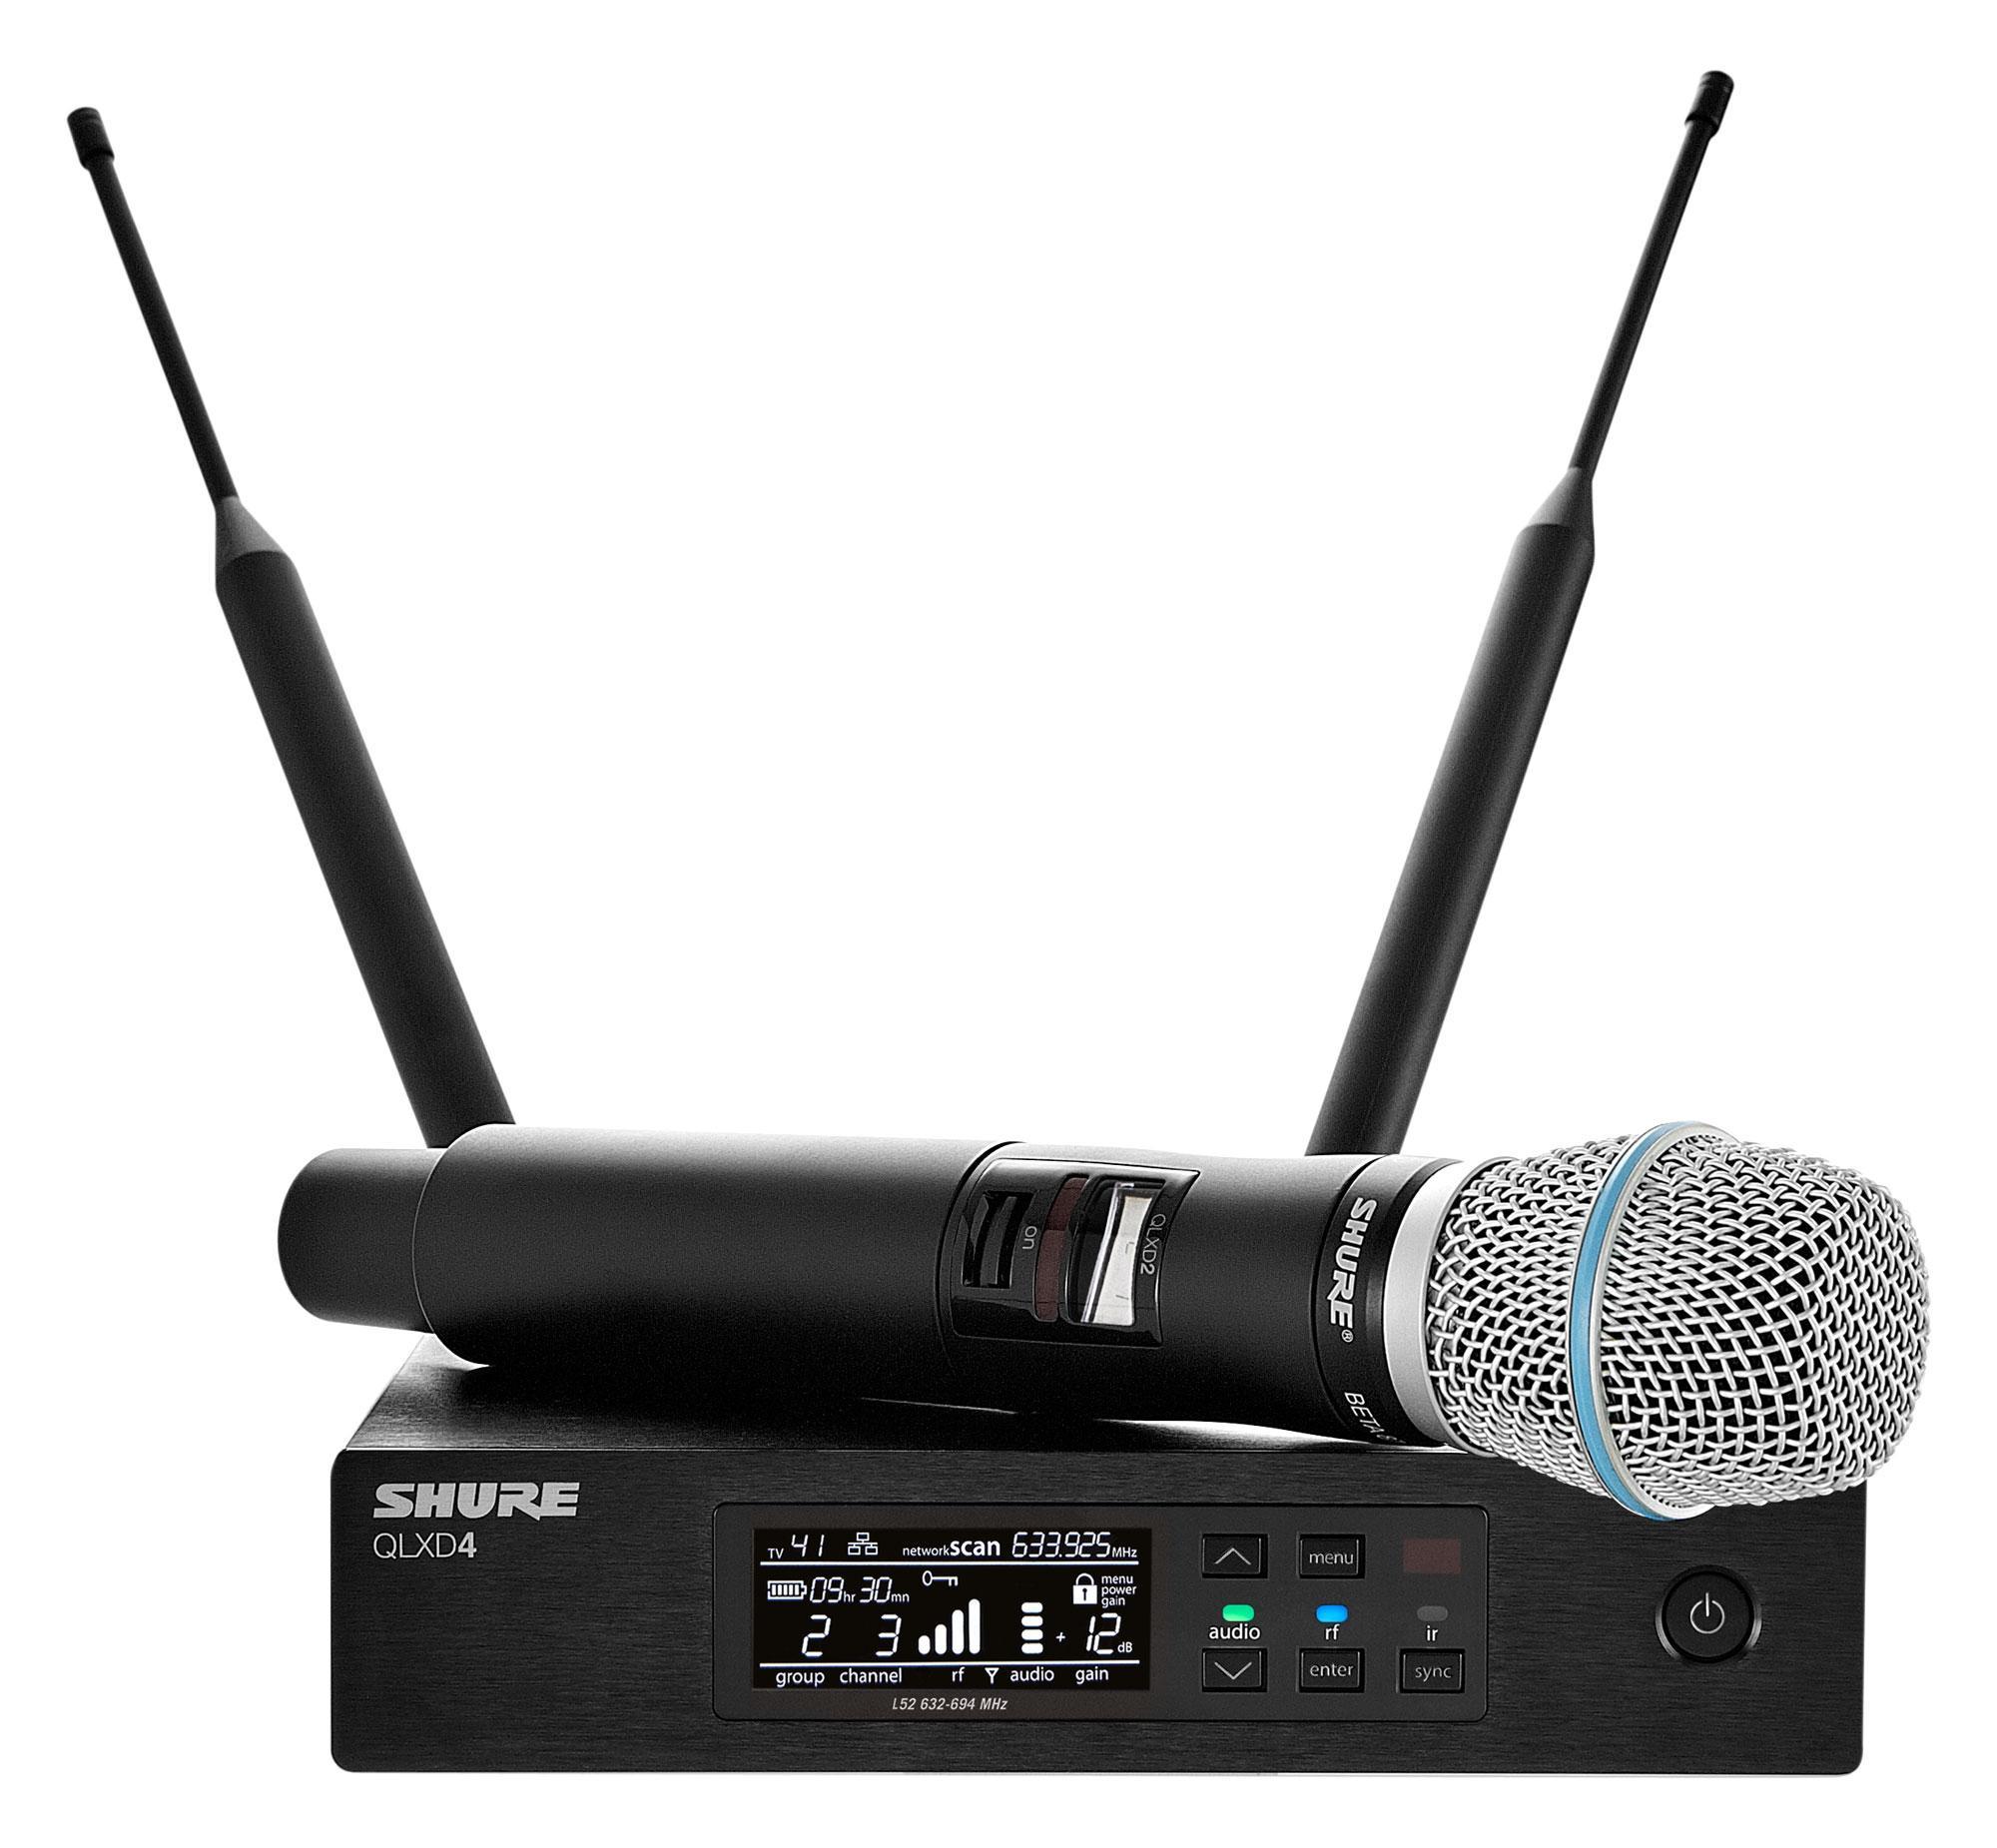 Shure QLXD24|B87 Z18 Digital Vocal Funksystem